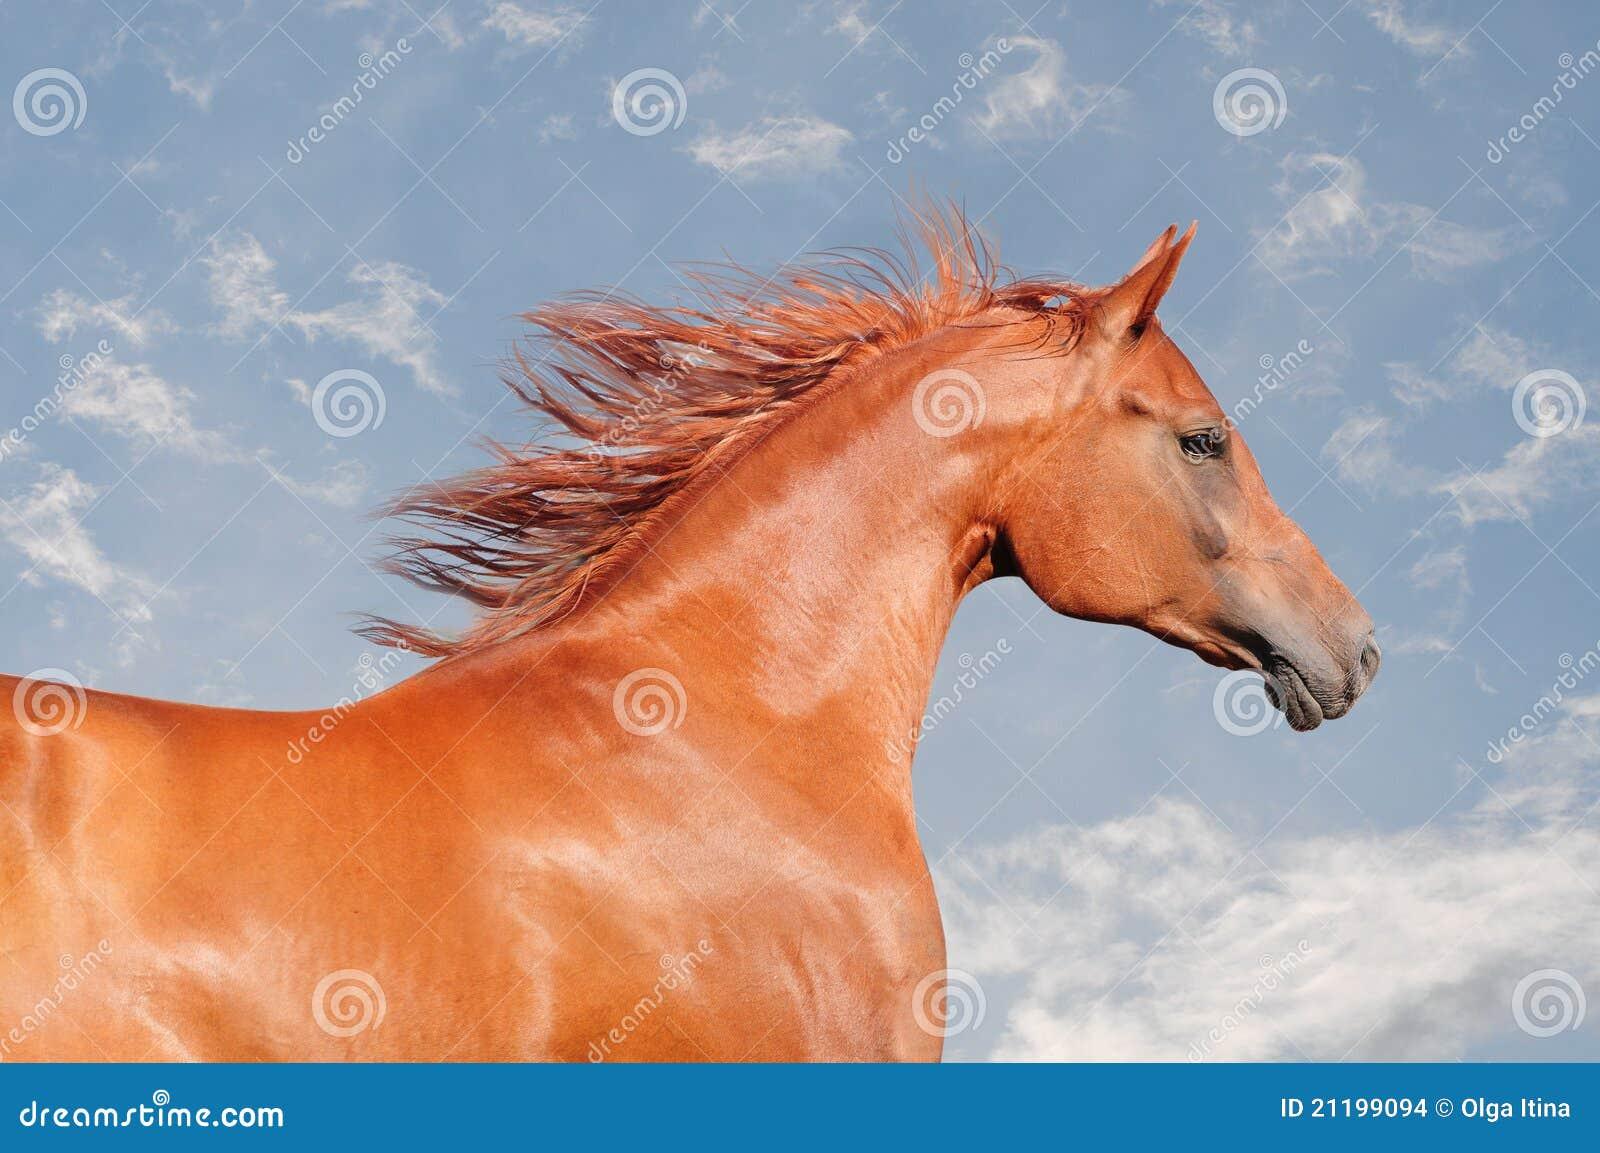 Chestnut arab horse portrait